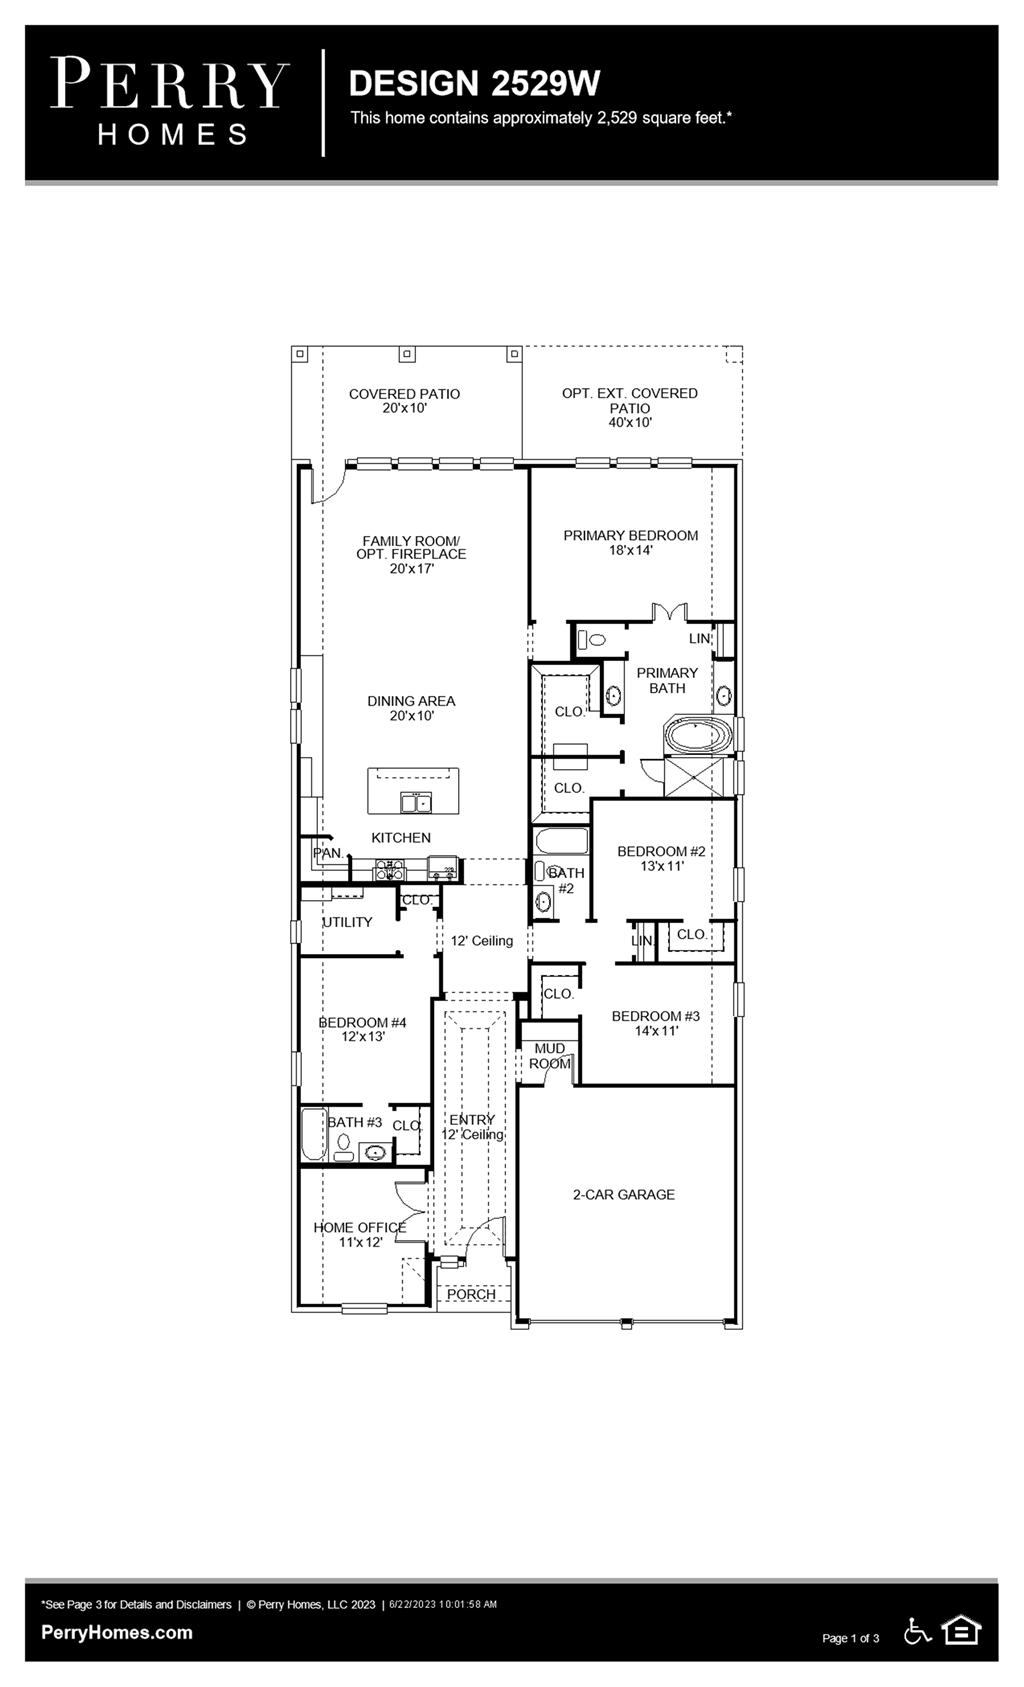 Floor Plan for 2529W